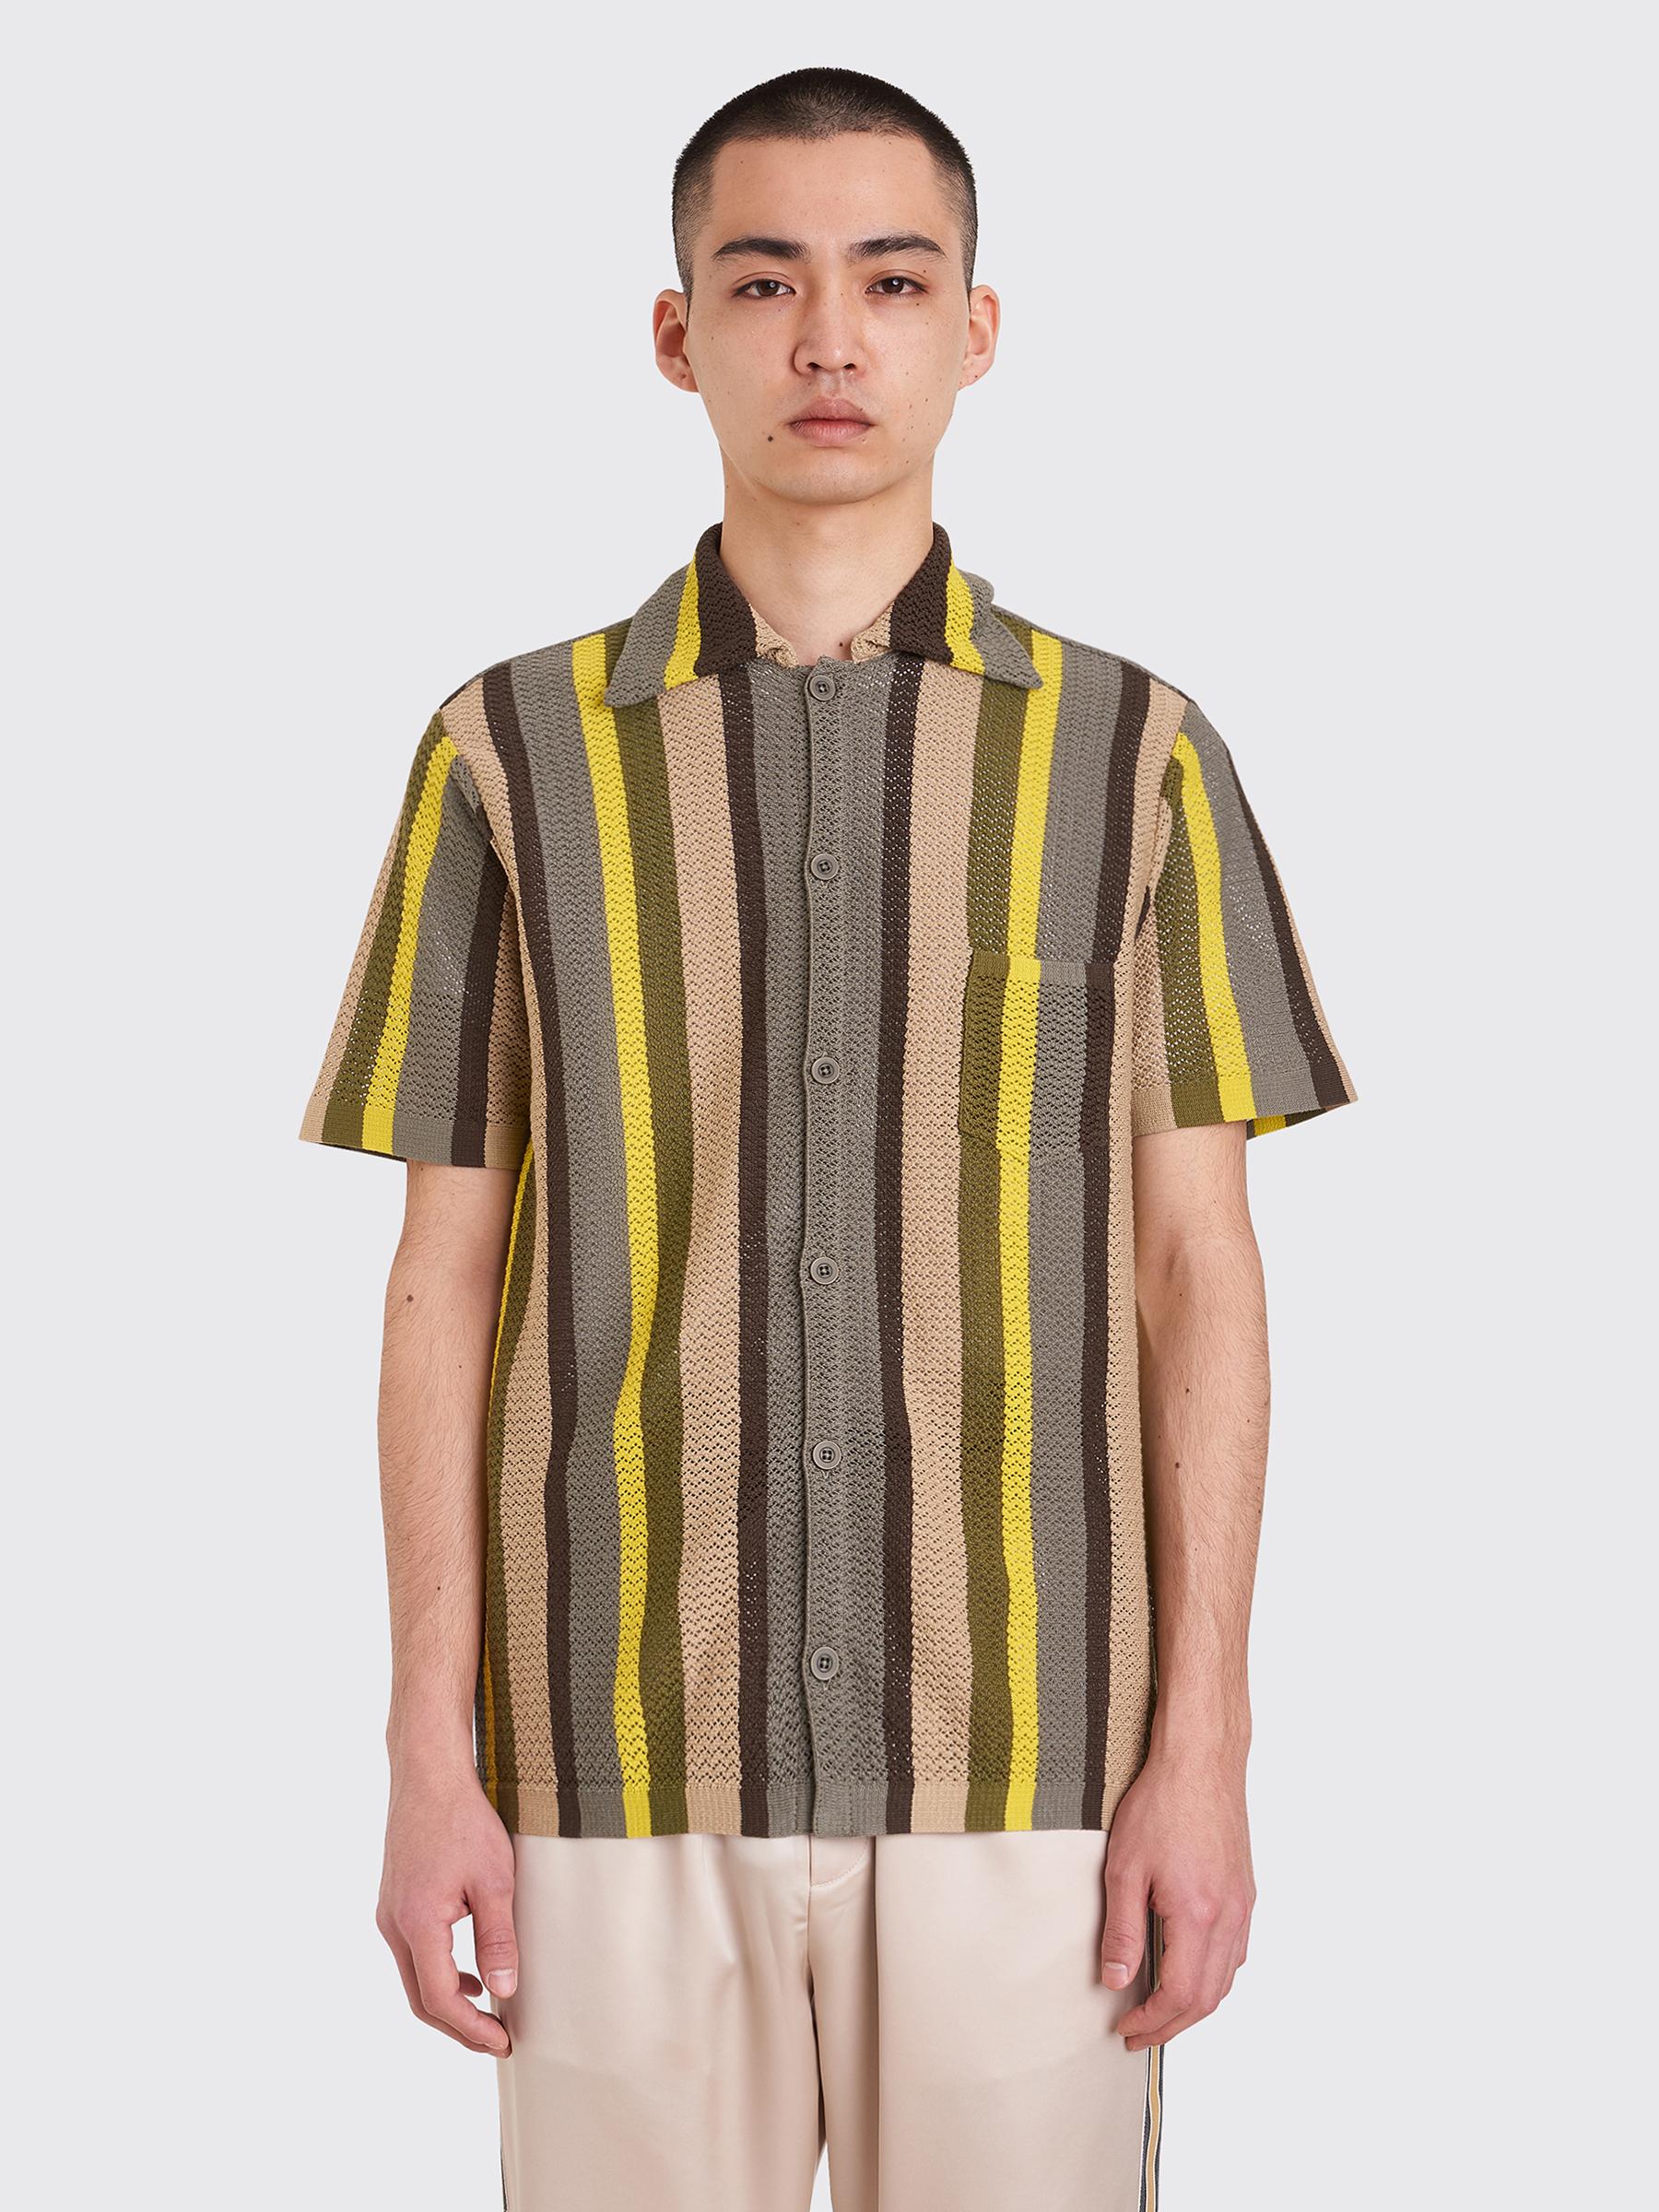 d9b796dc63 Très Bien - CMMN SWDN Wes Knitted Shirt Stripe Green